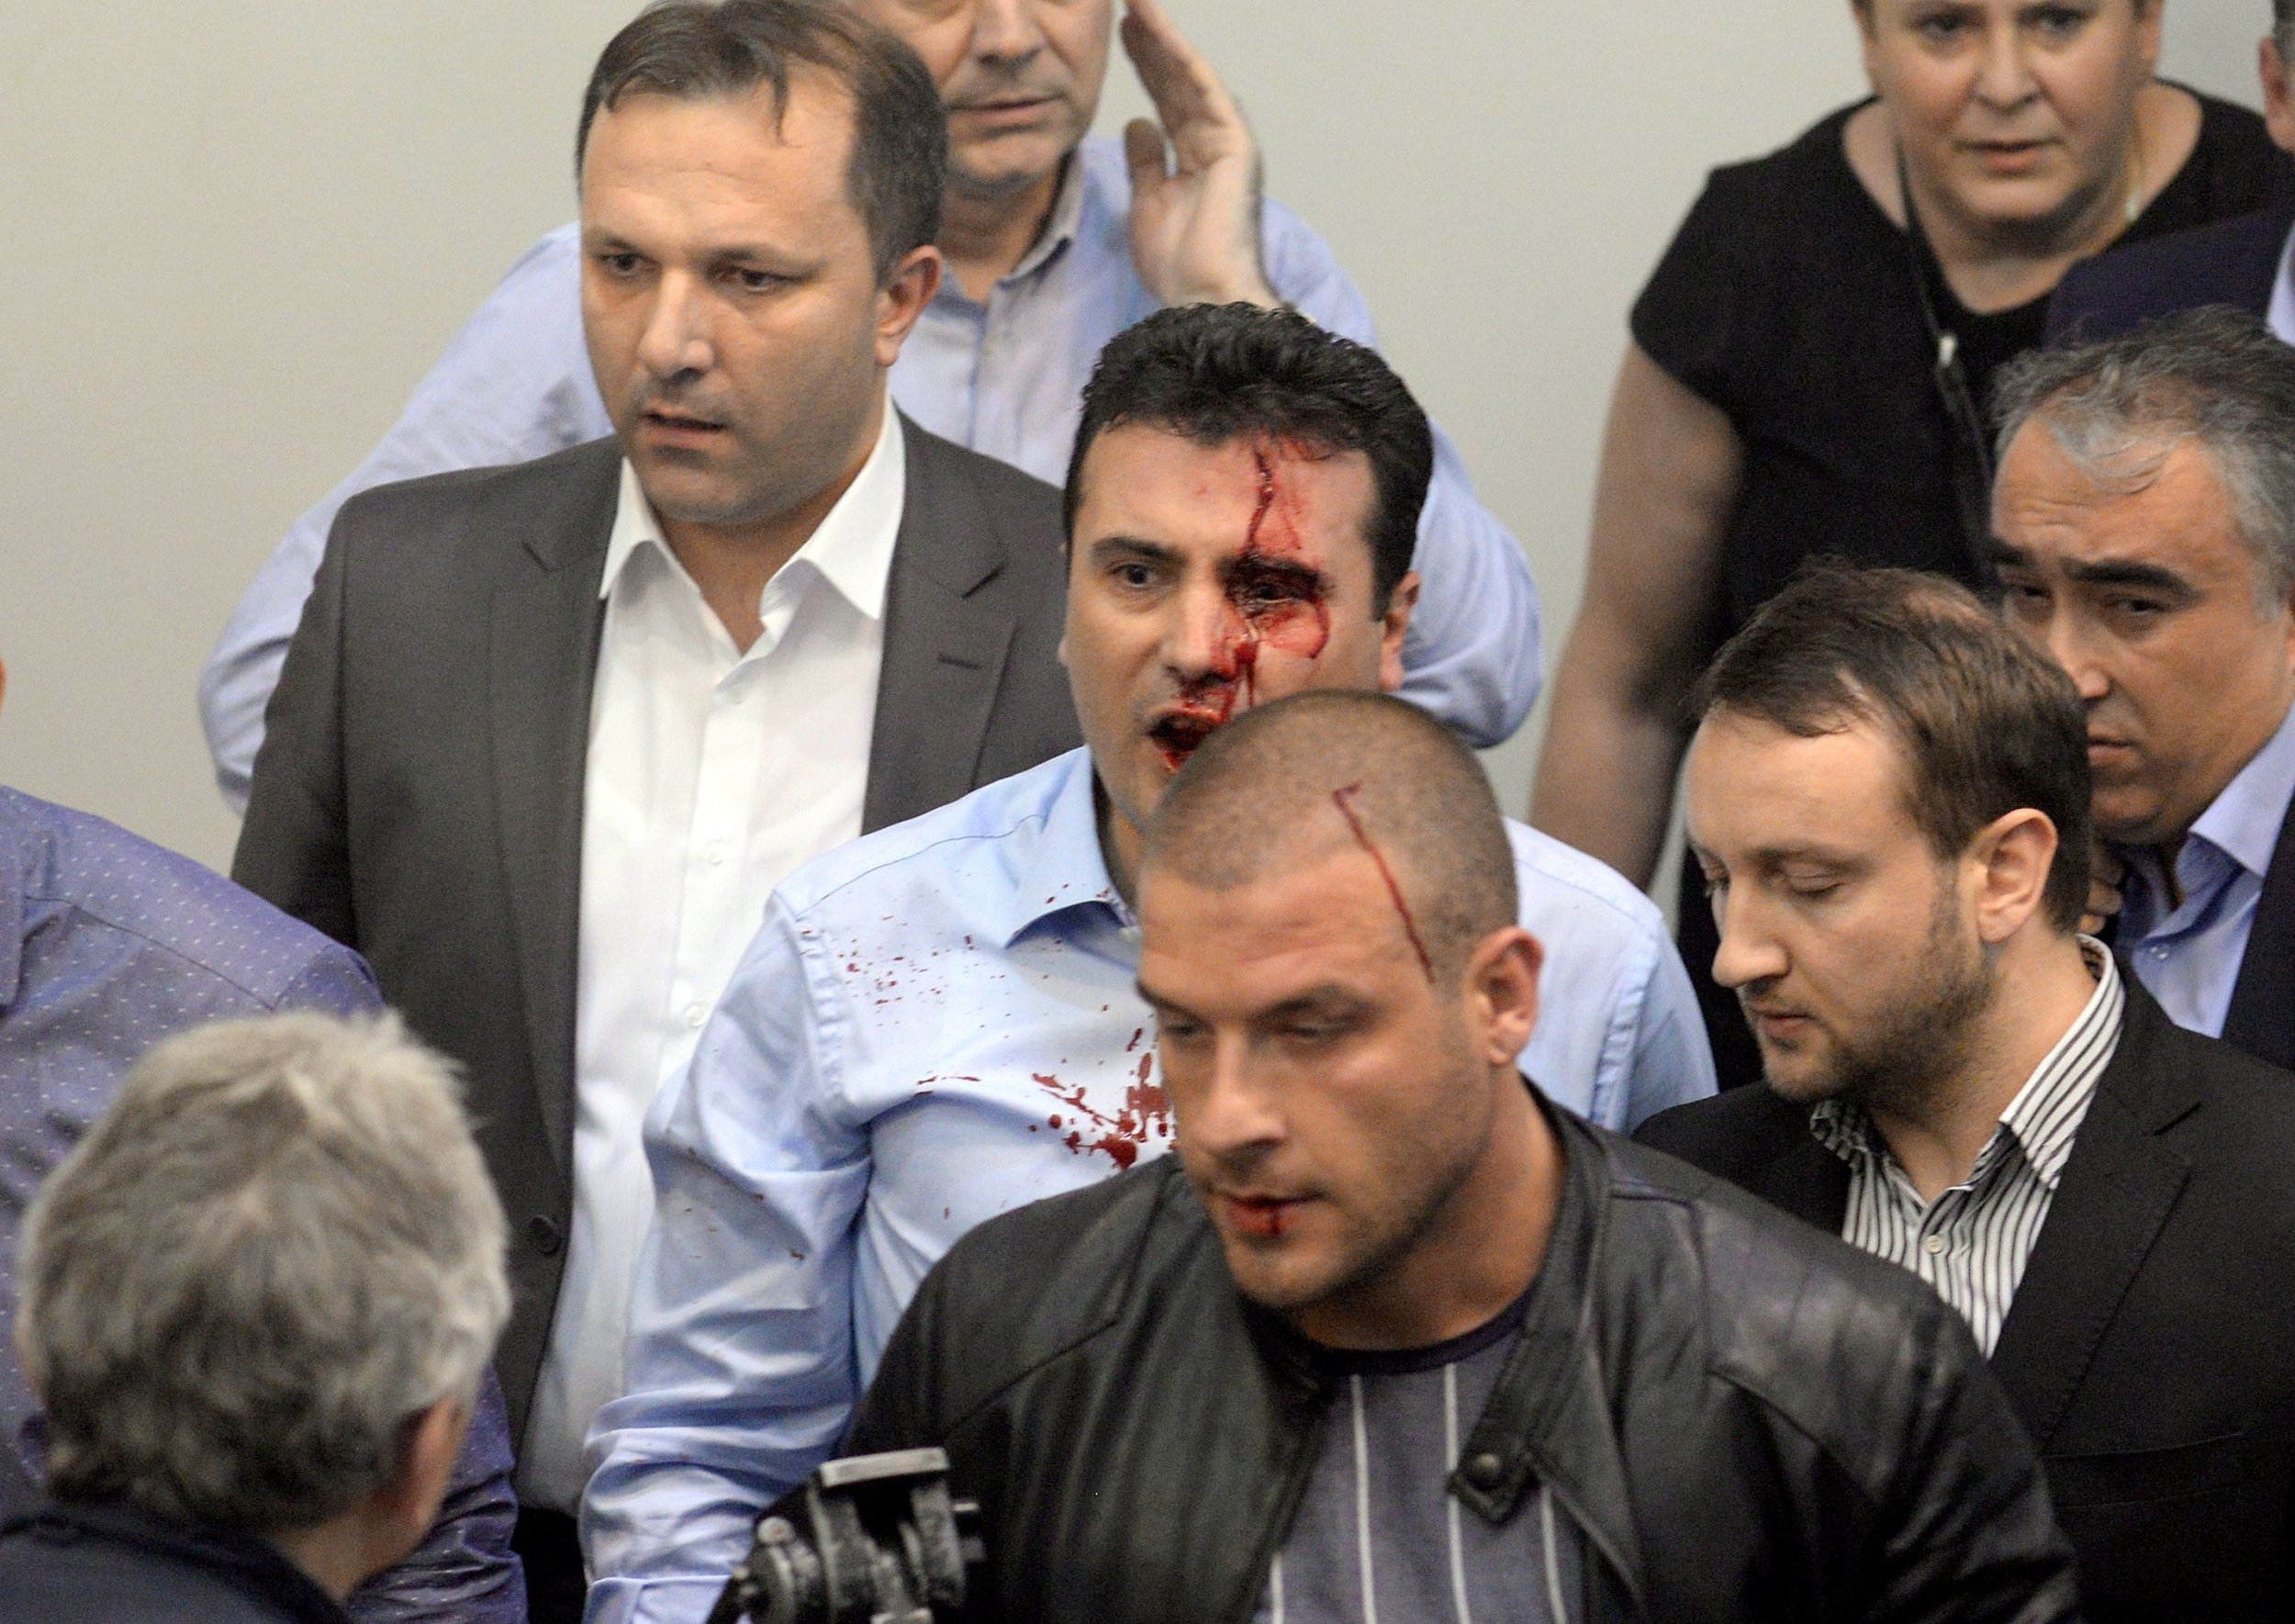 05_02_Macedonia_Senators_01